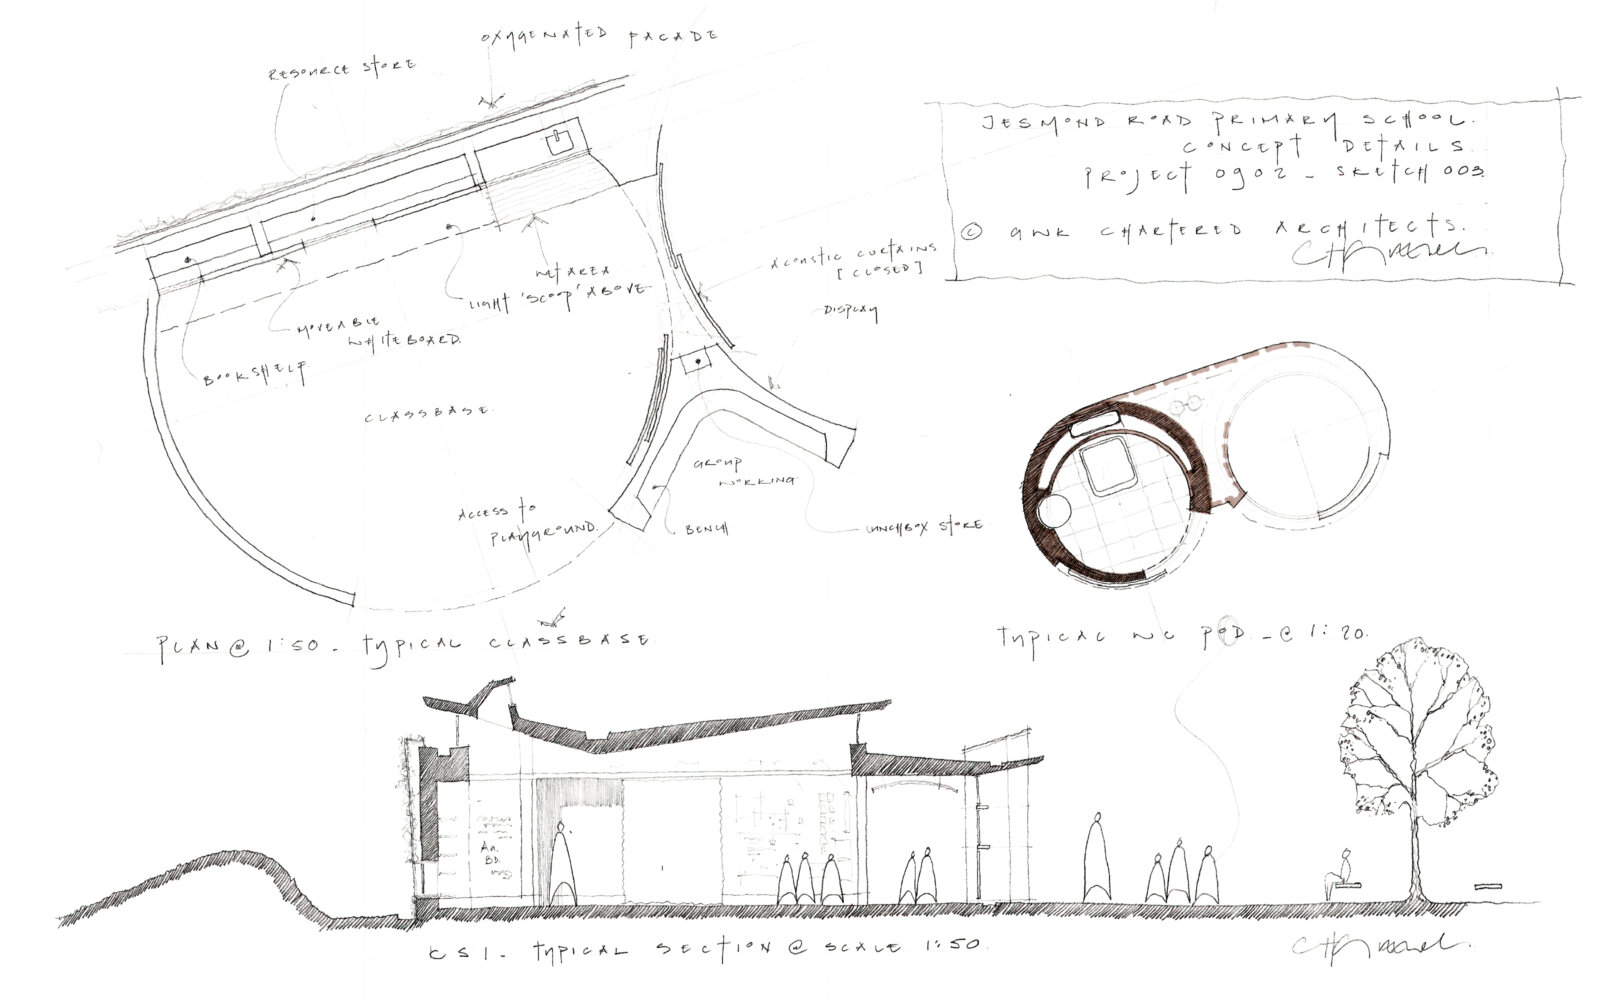 Jesmond Gardens Primary School concept sketches